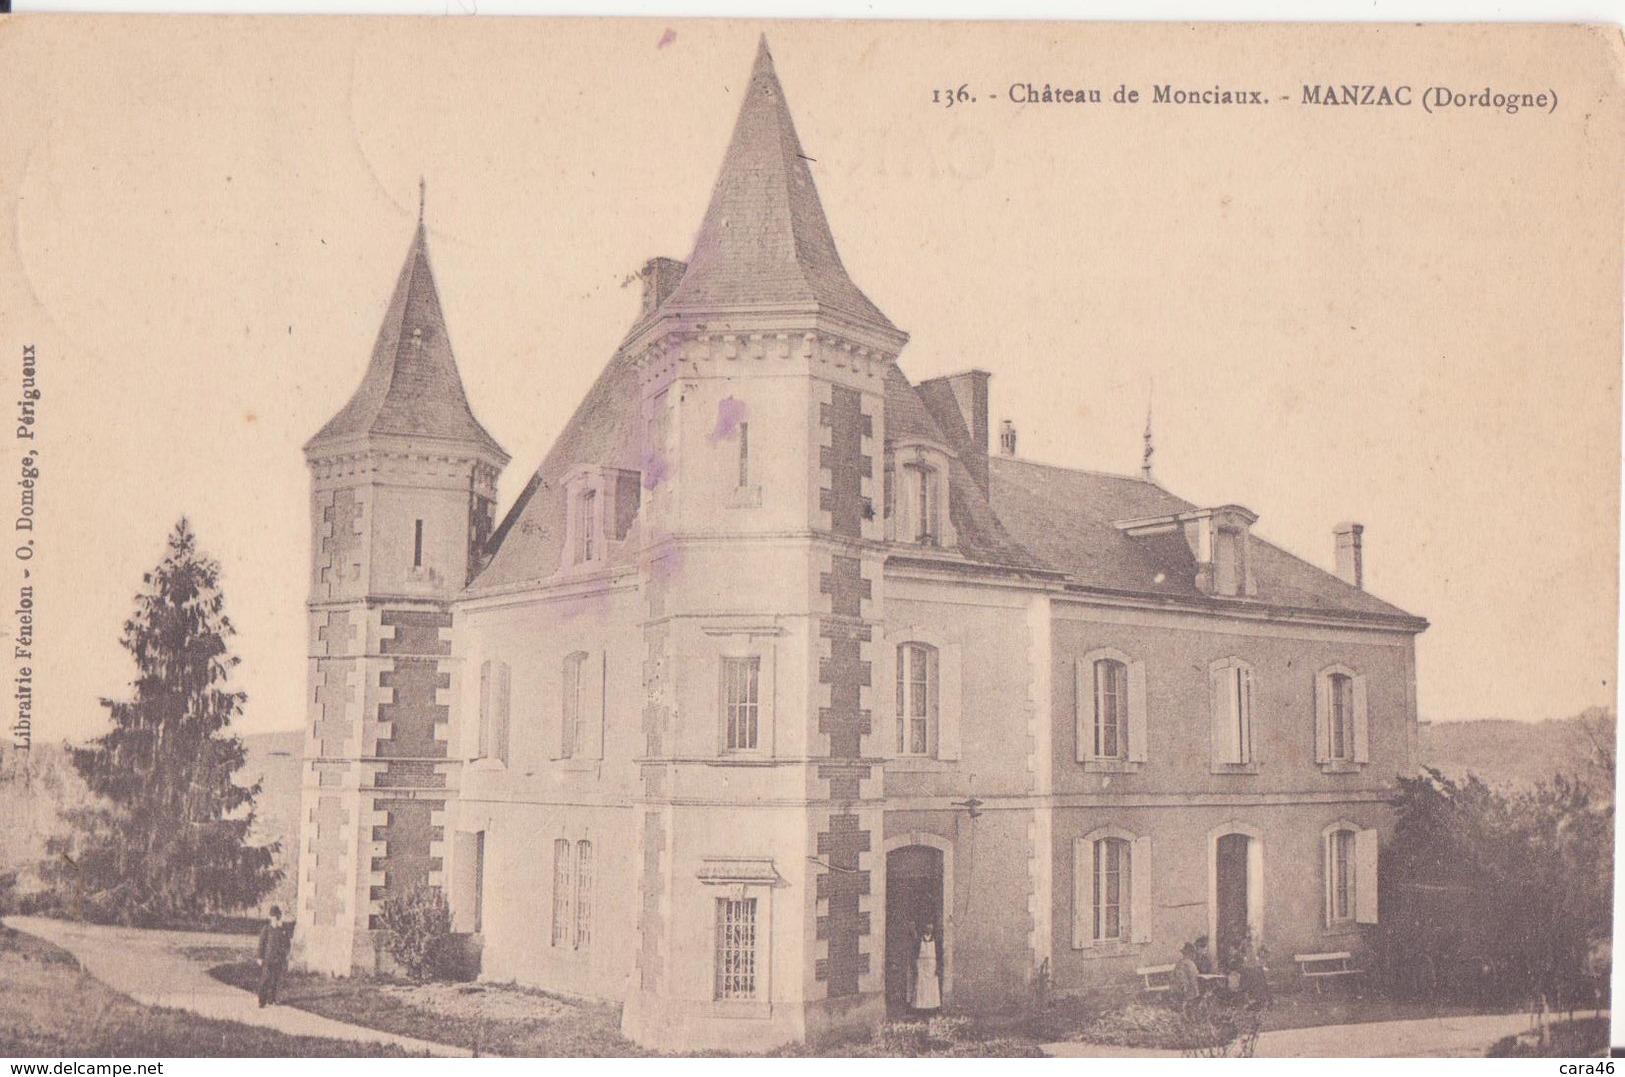 CPA - 136.château De Monciaux - MANZAC - France